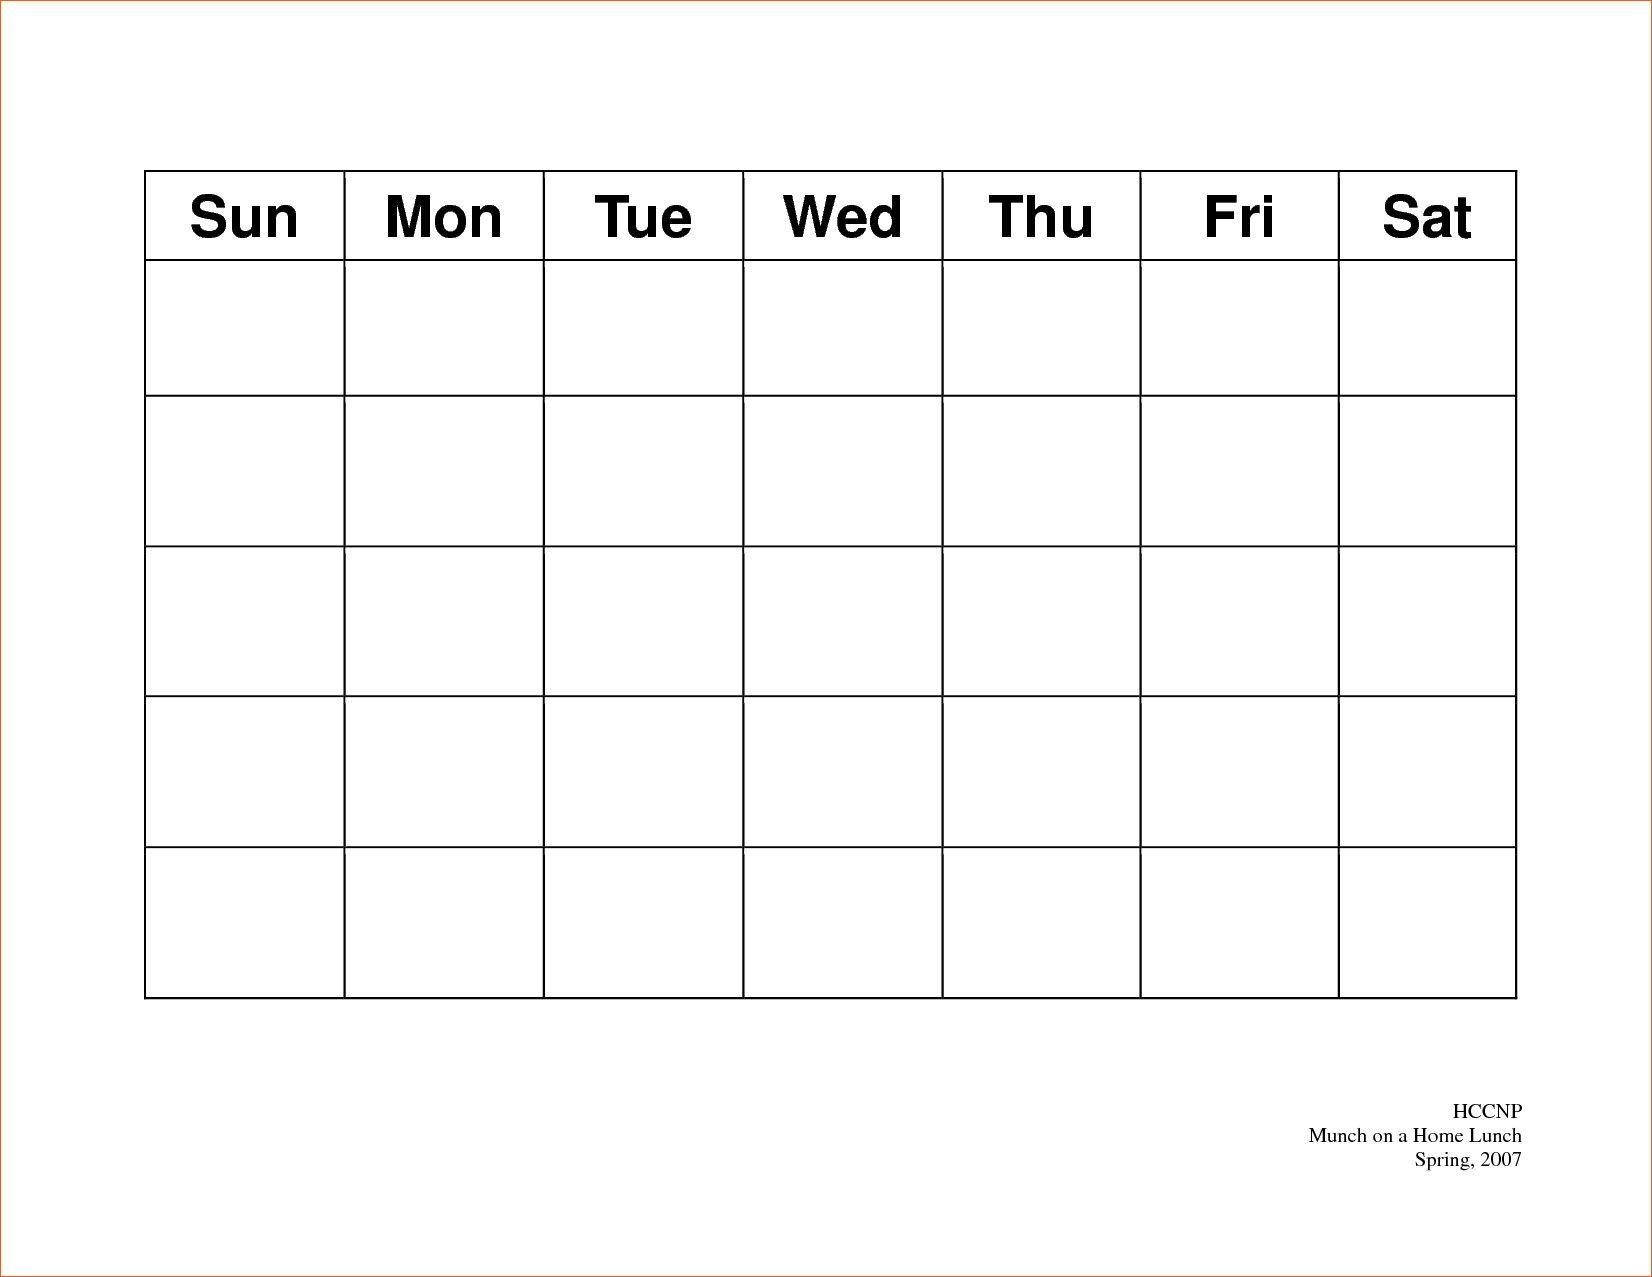 Free Printable Calendar 5 Day Week | Calendar Printables Free Templates within 5 Day Blank Calendar